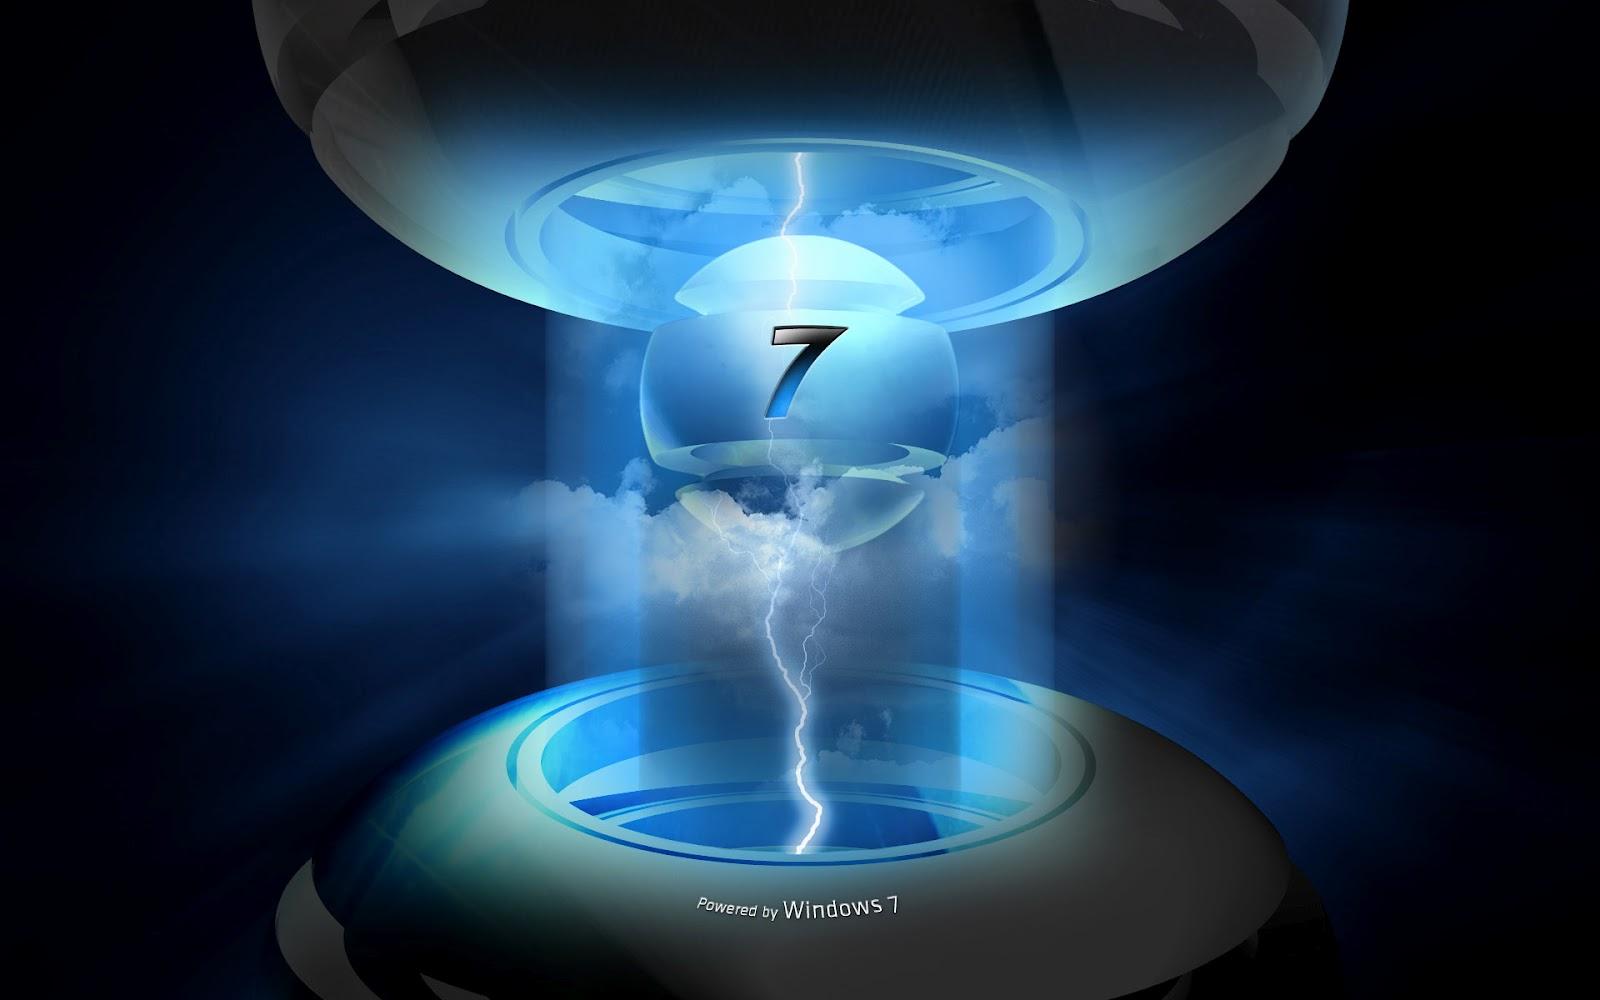 ultimate acer 3ydb8 yy3p4 g7fcw gjmpg vk48c vista ultimate advent 1600x1000